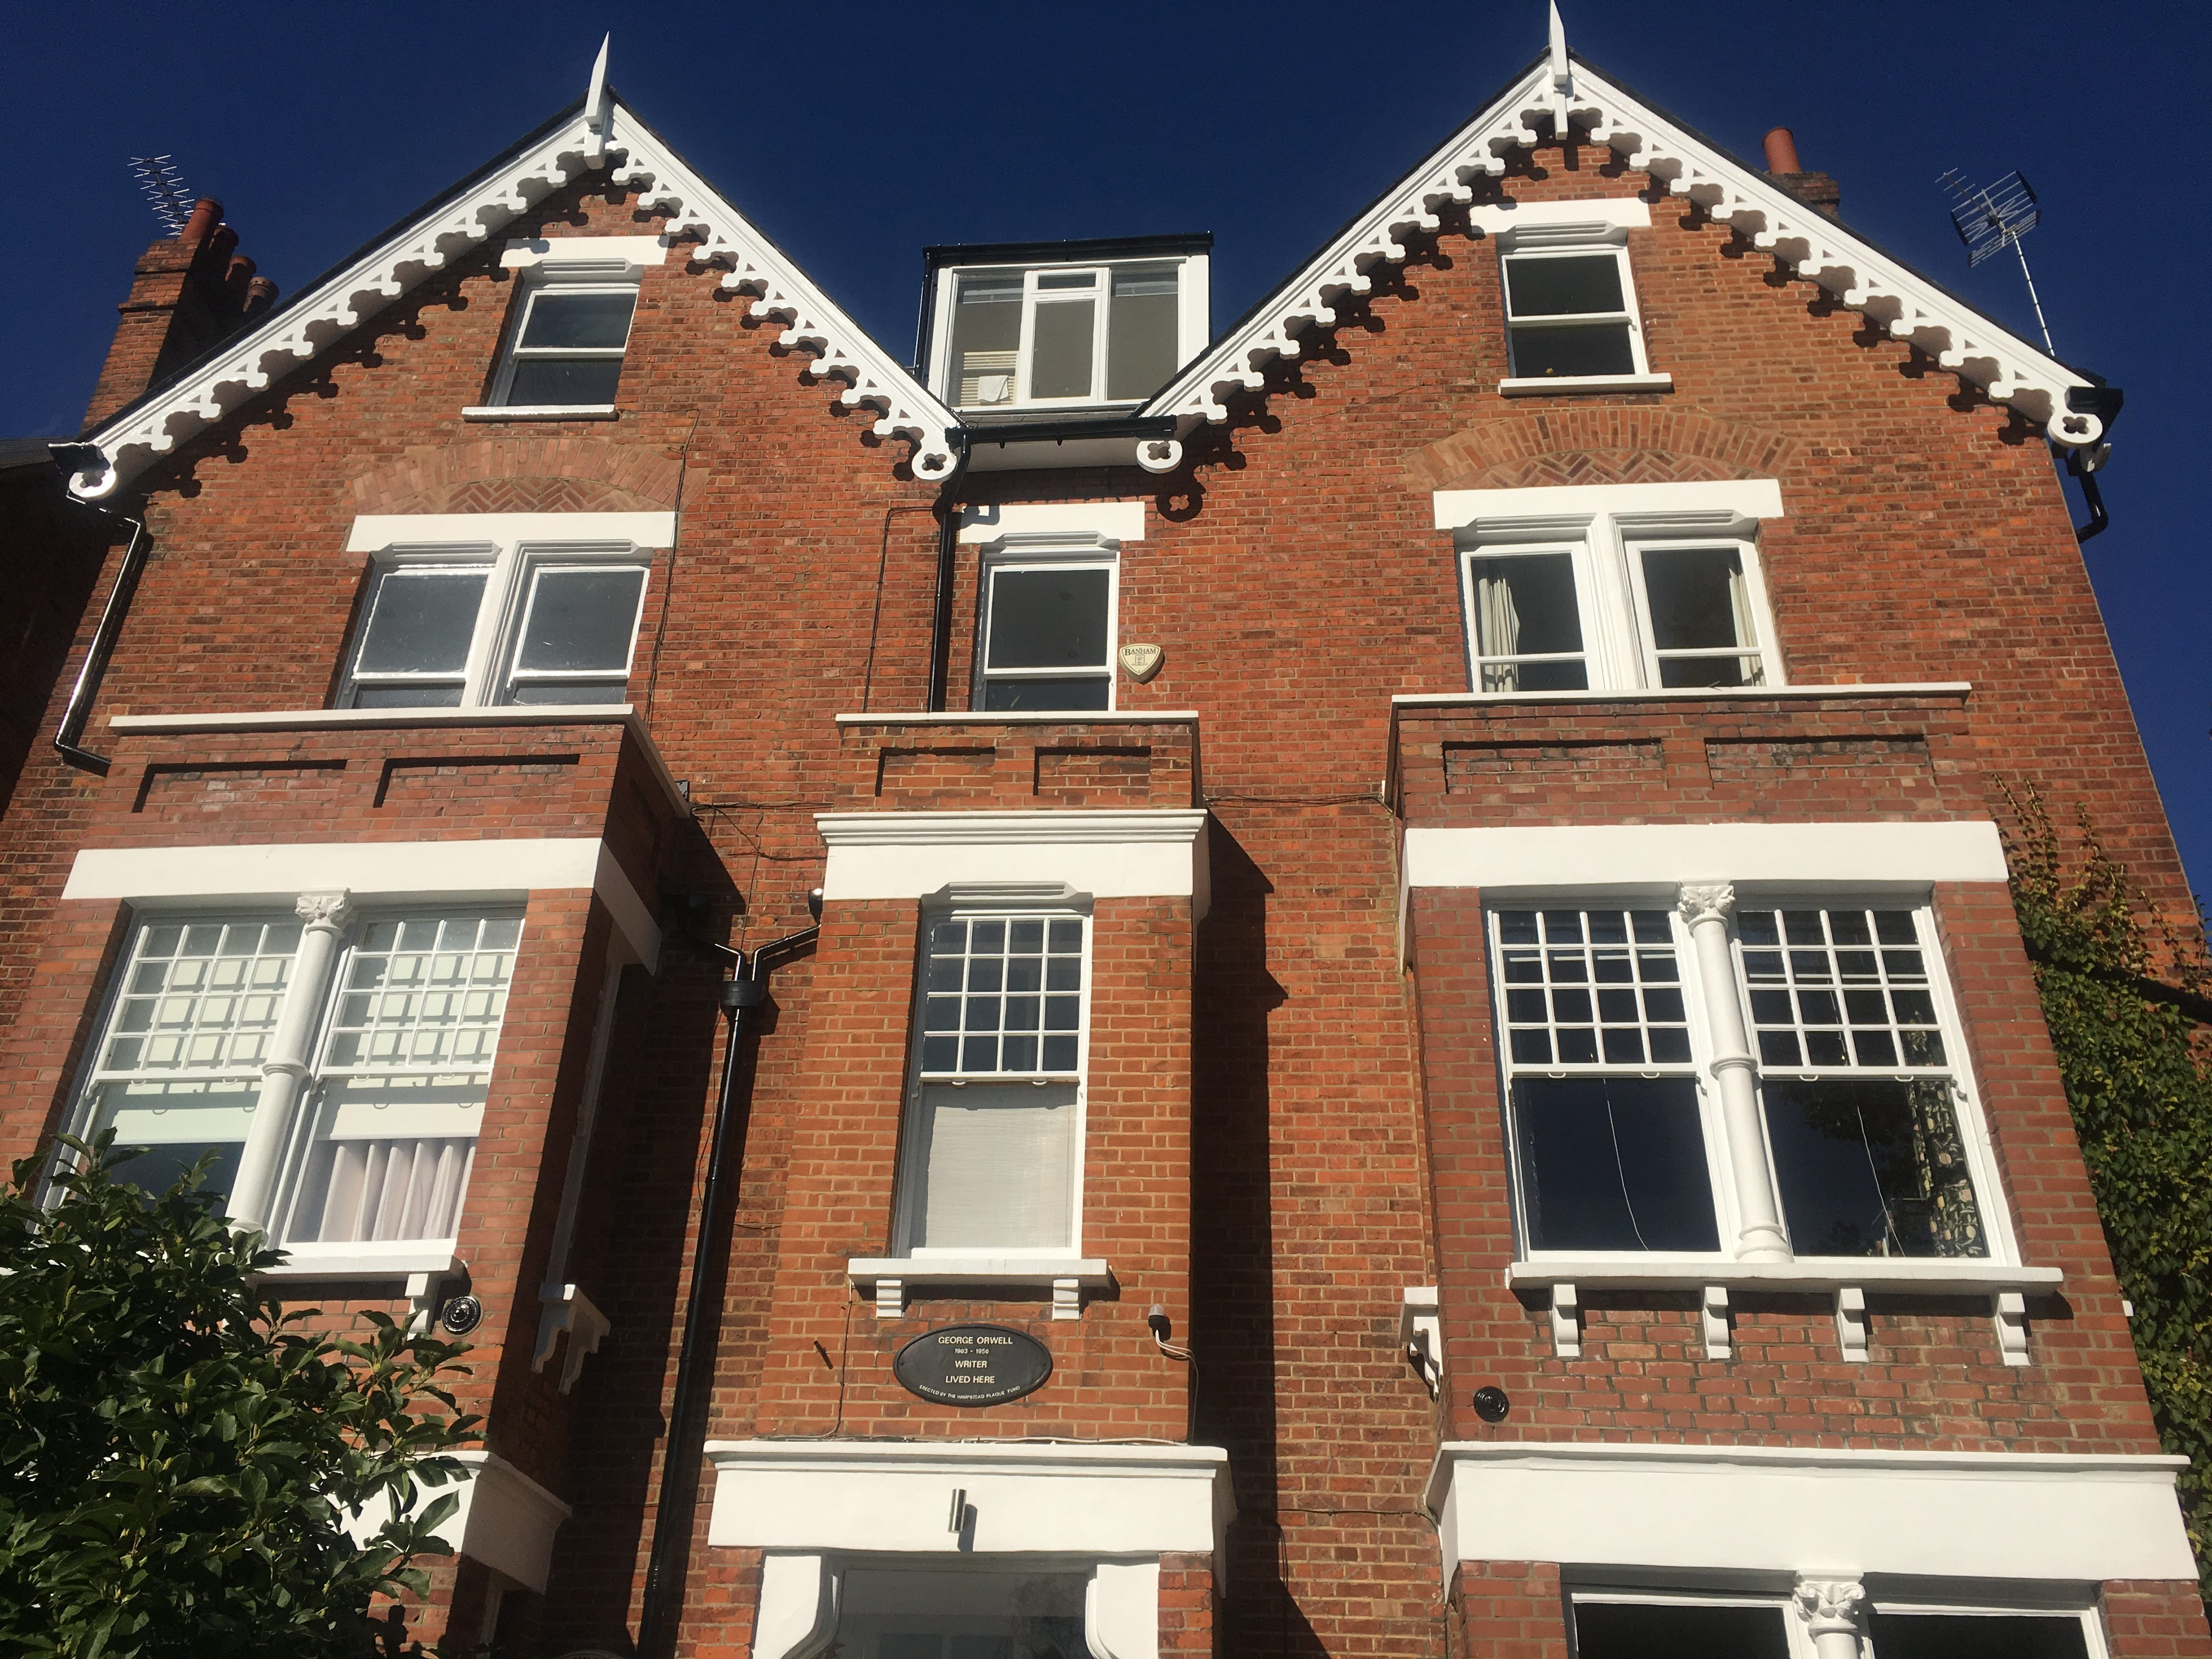 George Orwell lived here - next to Hampstead Heath